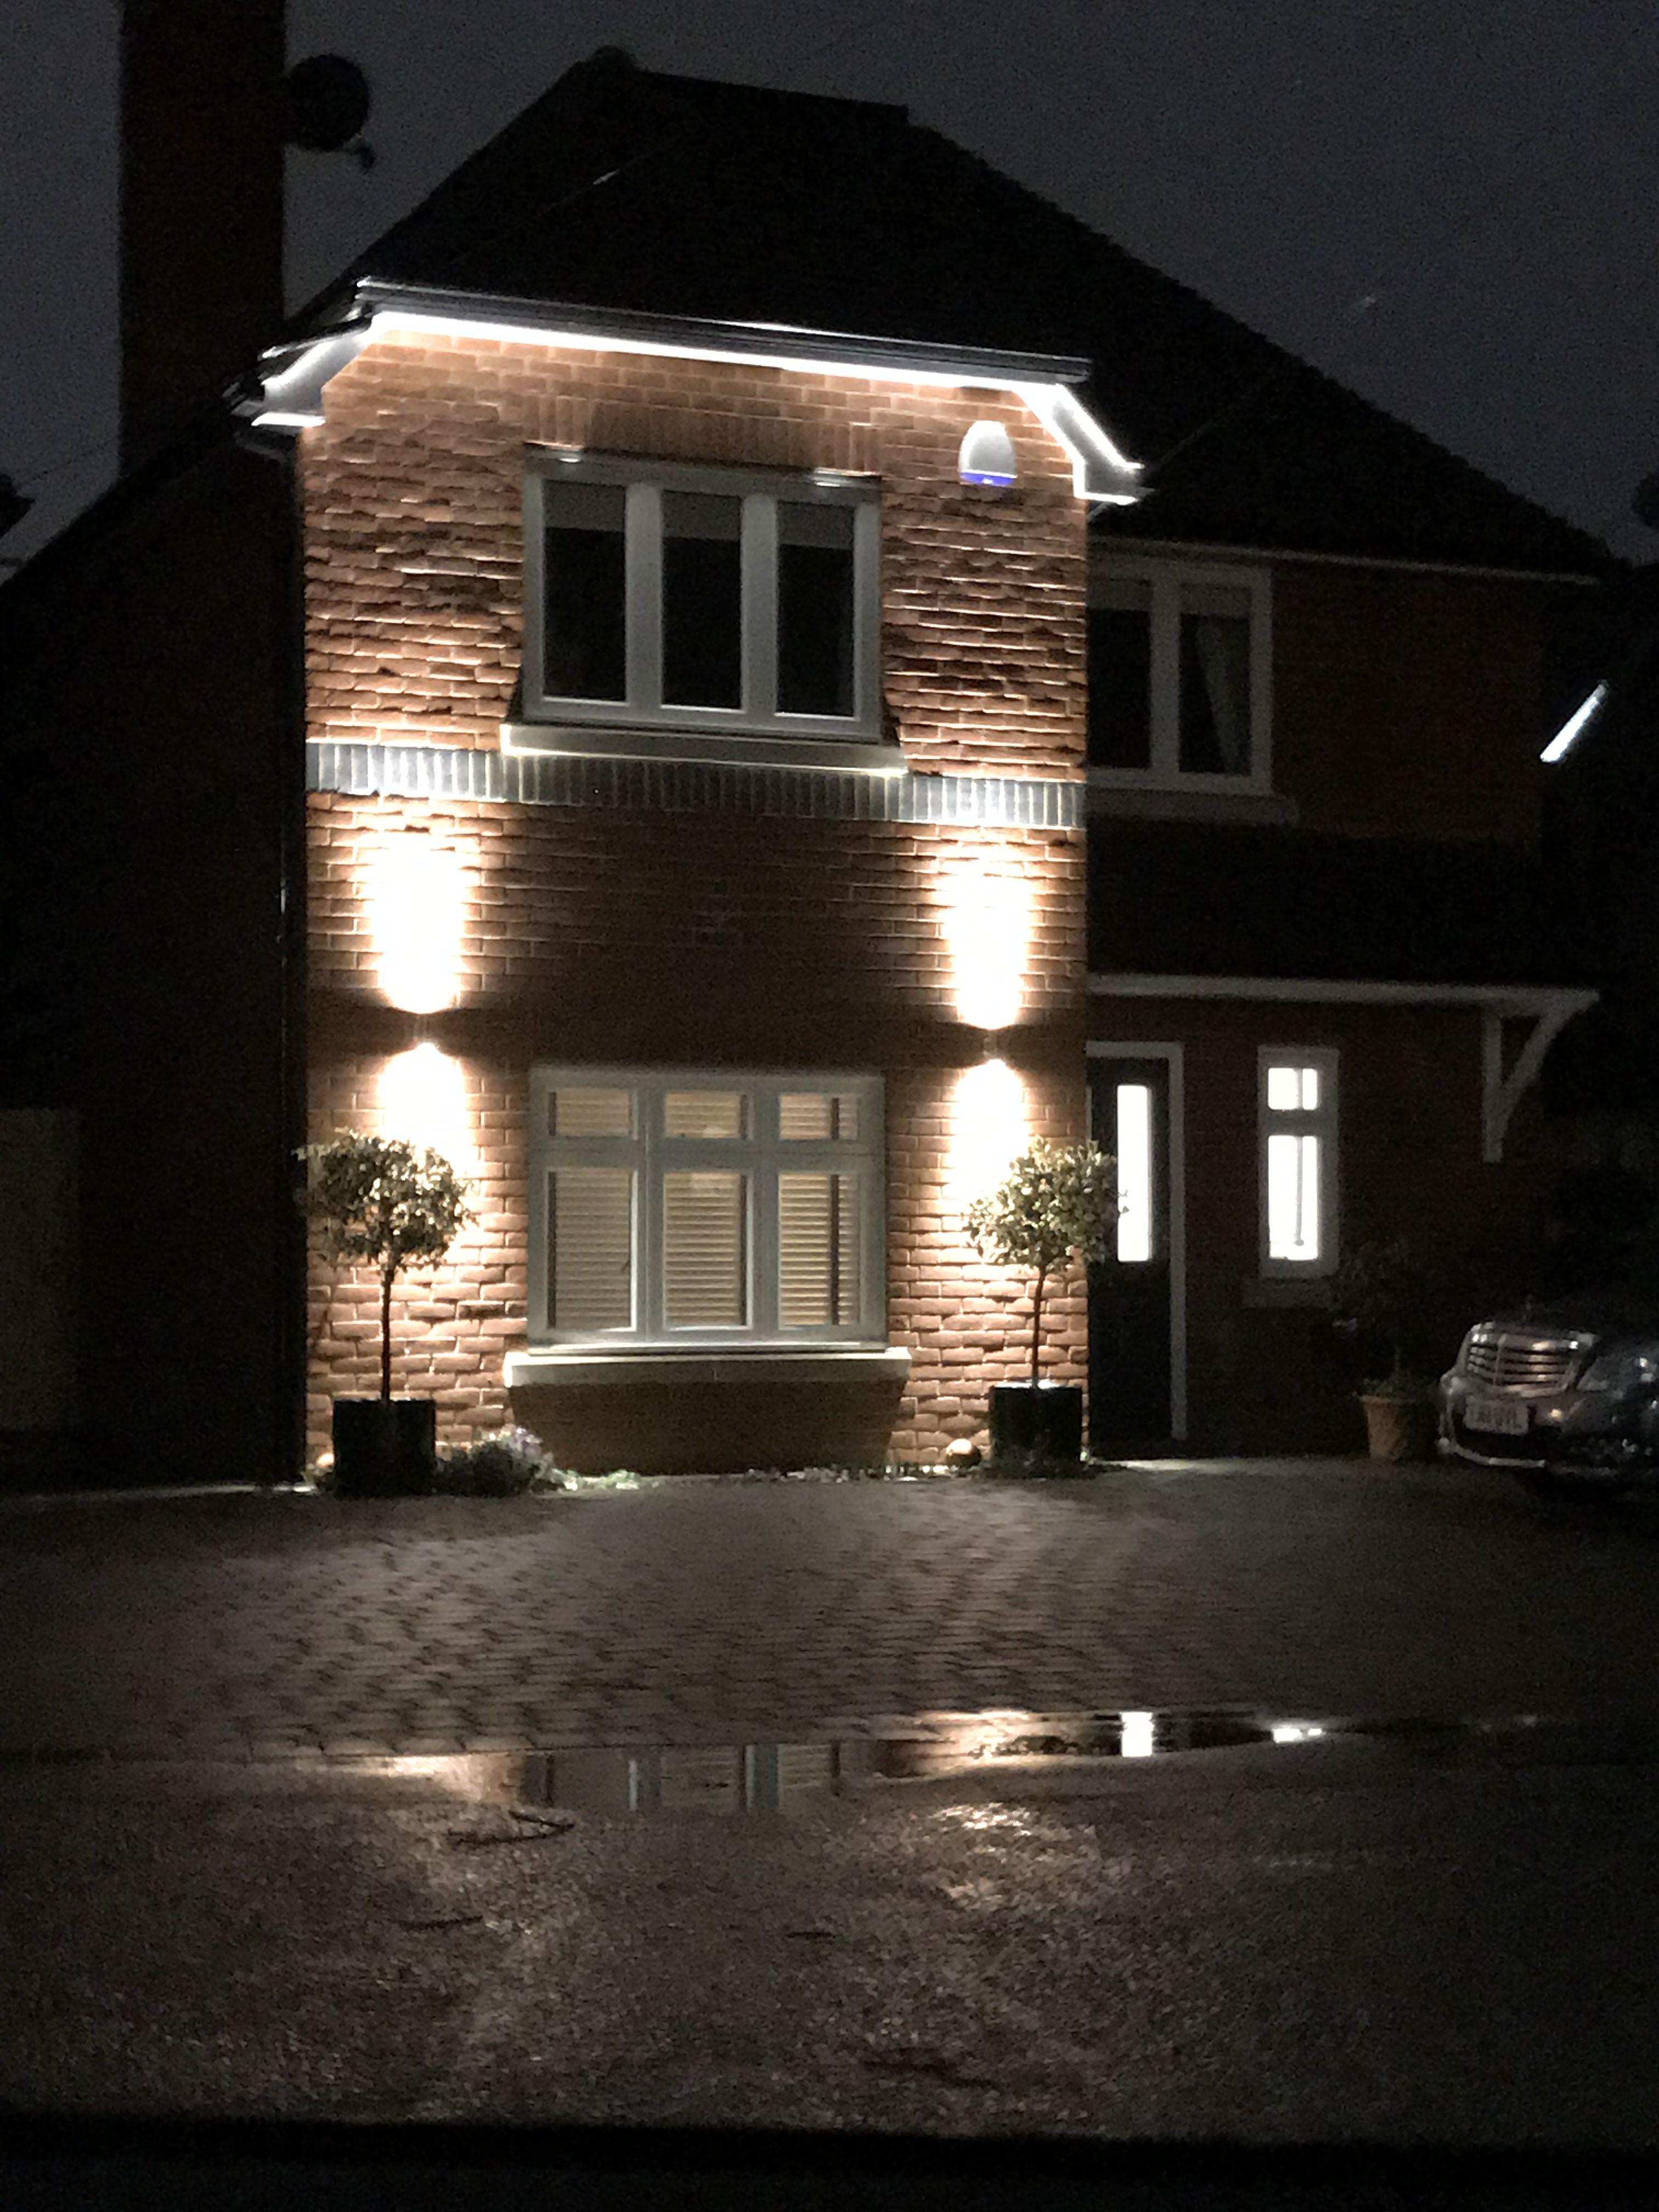 External Lighting For House In 2019 Exterior Lights